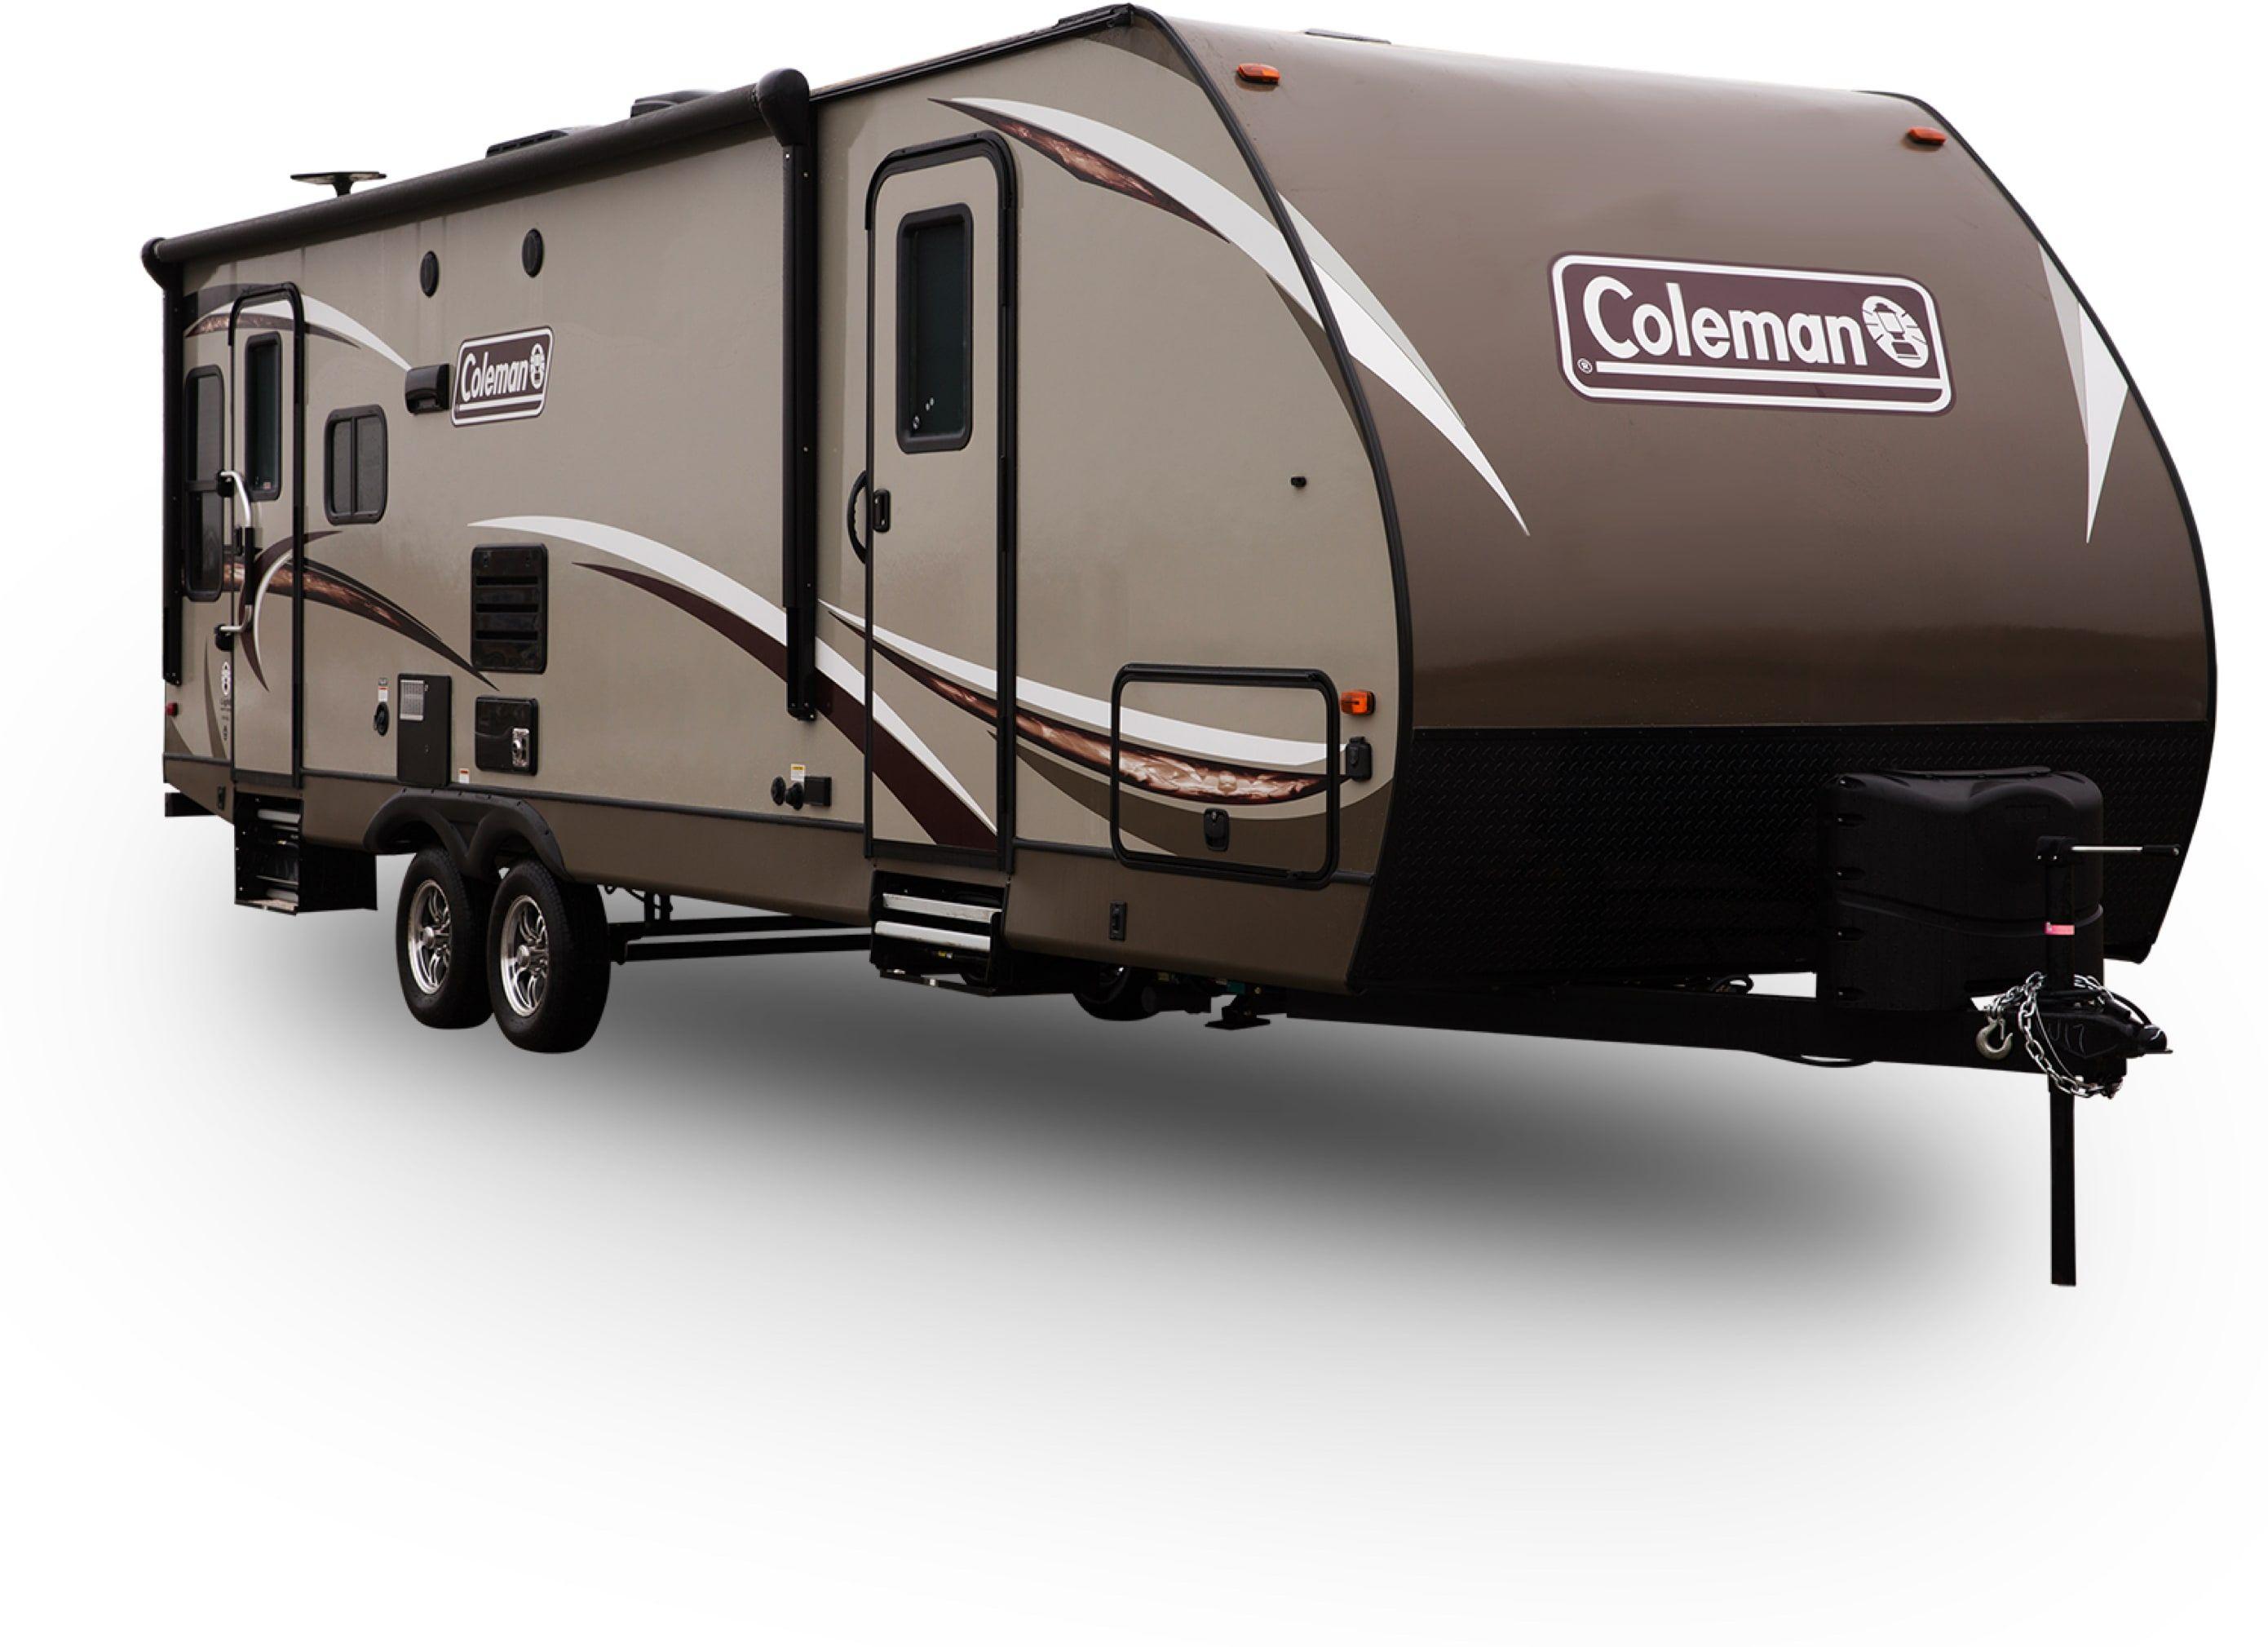 Coleman Light 2605RL Recreational vehicles, Used